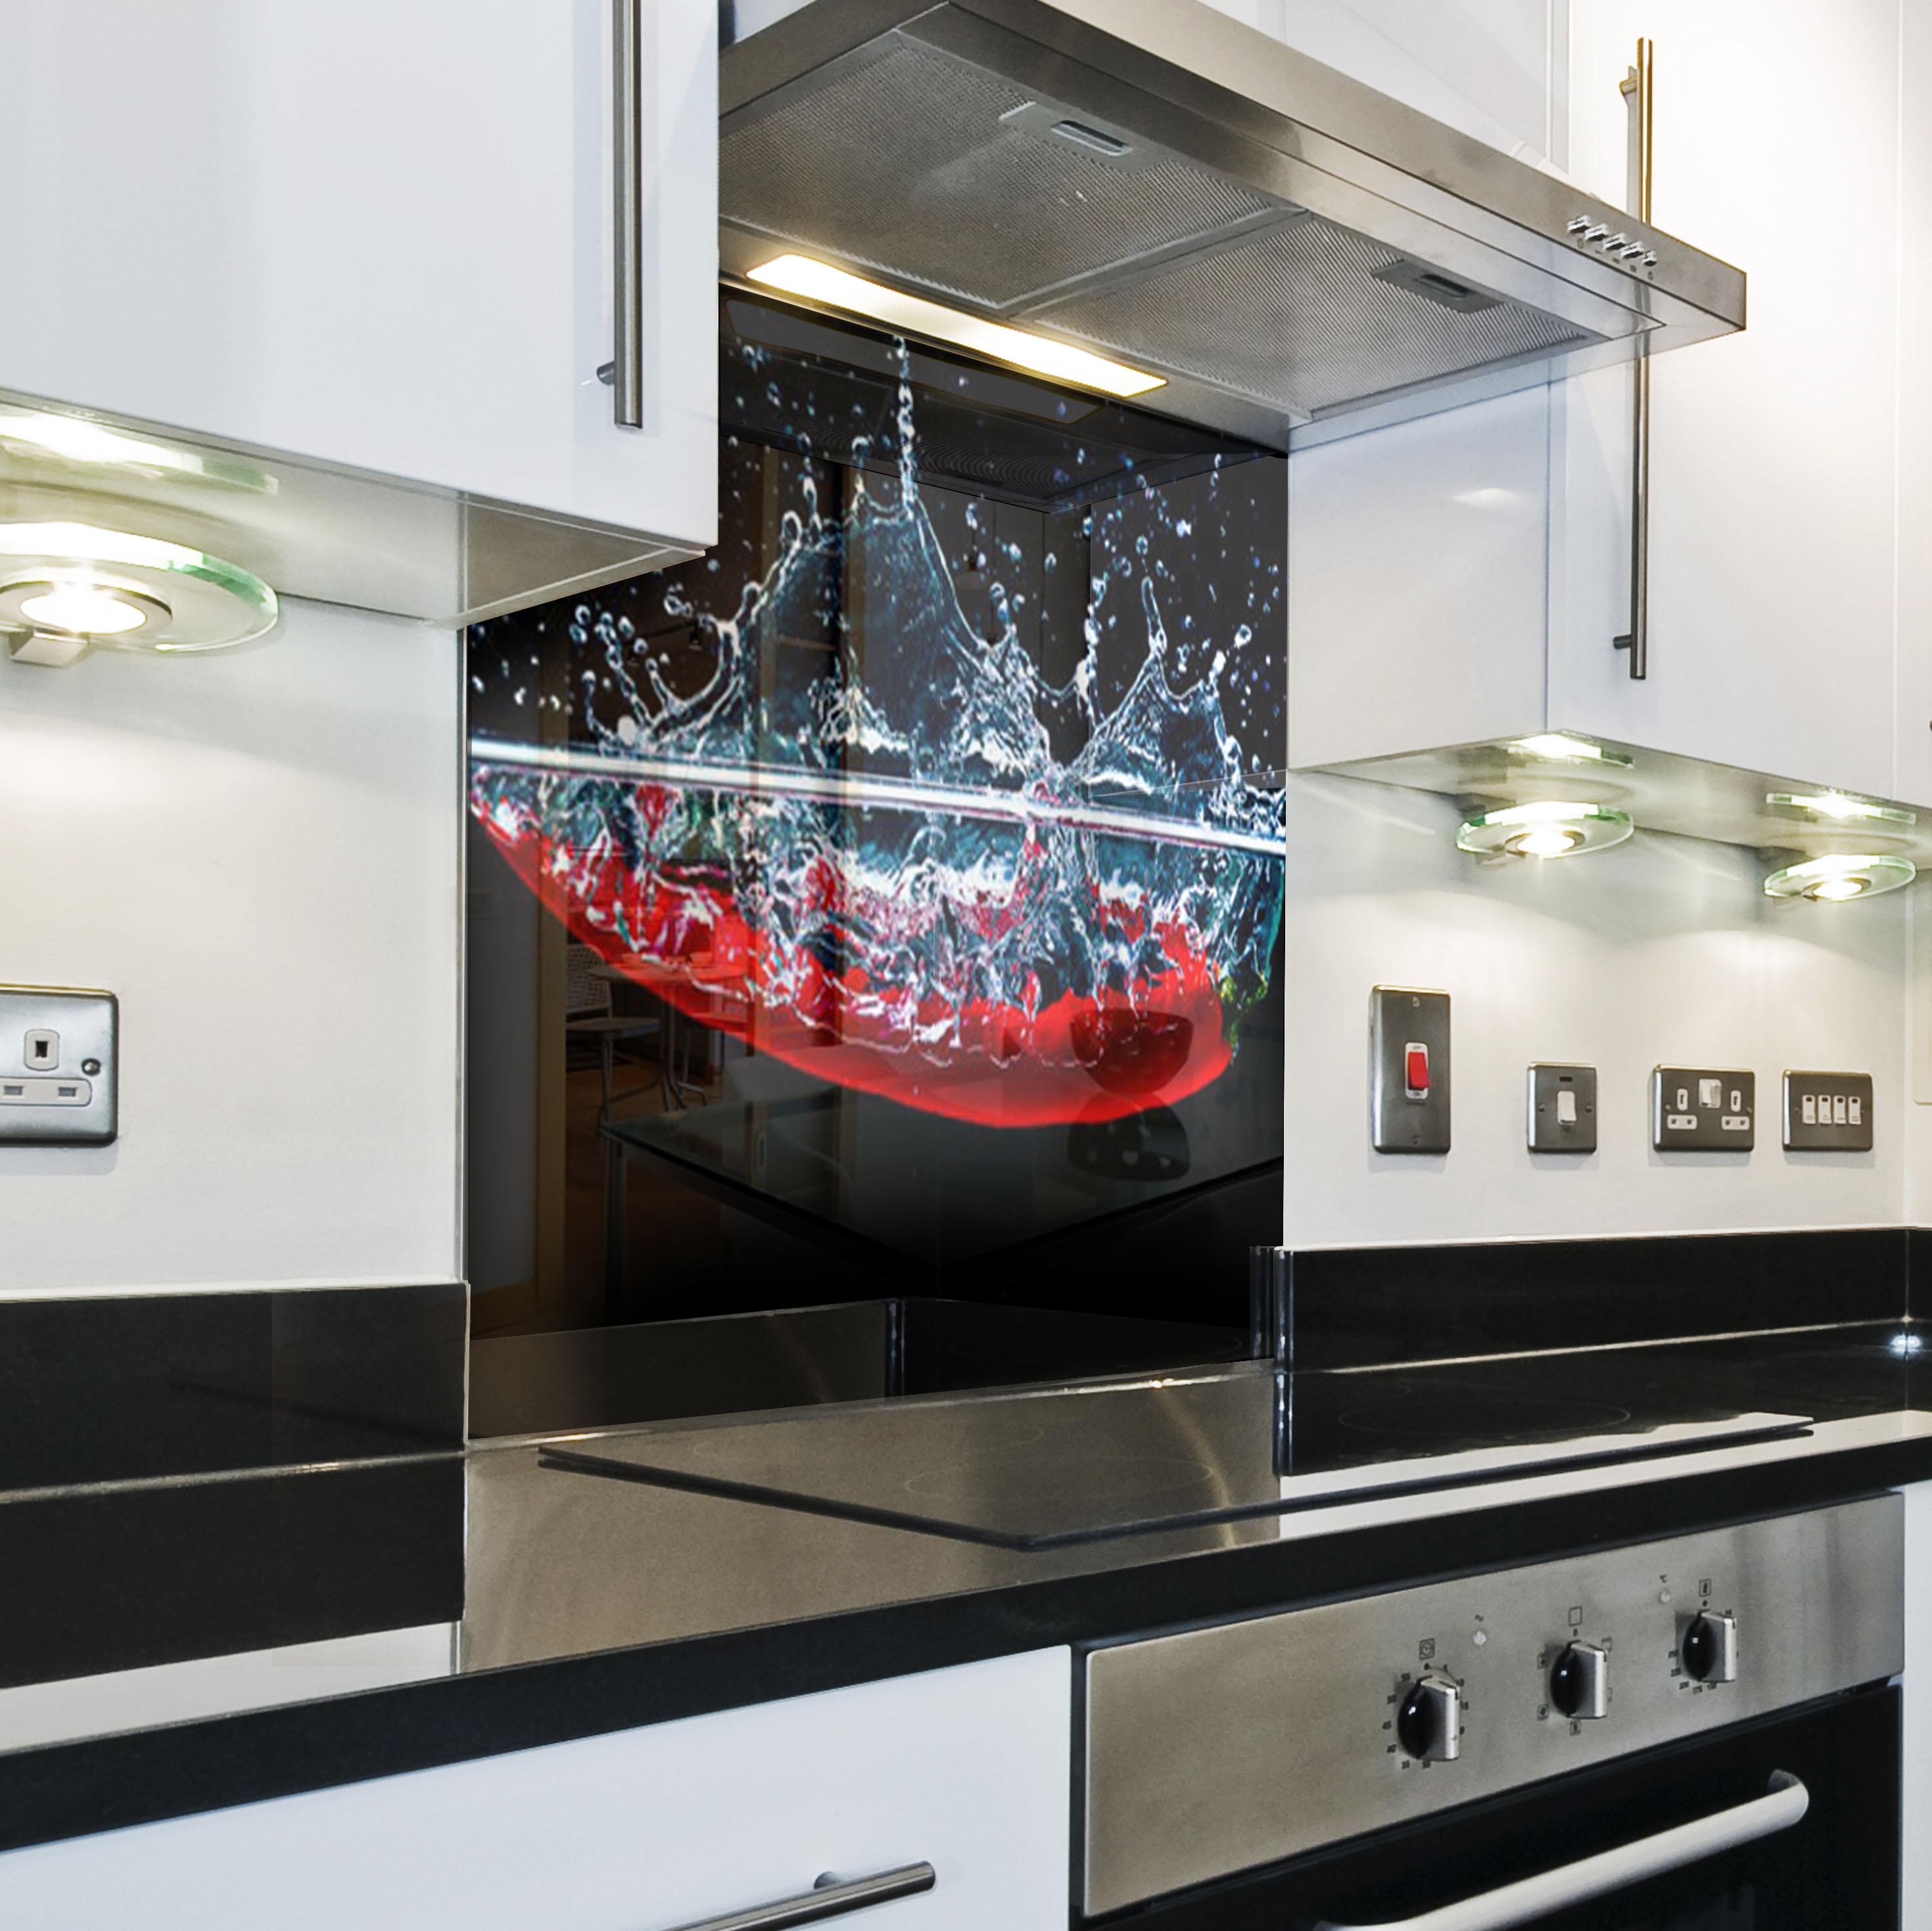 Splashback paraspruzzi paraschizzi cucina pannello ...